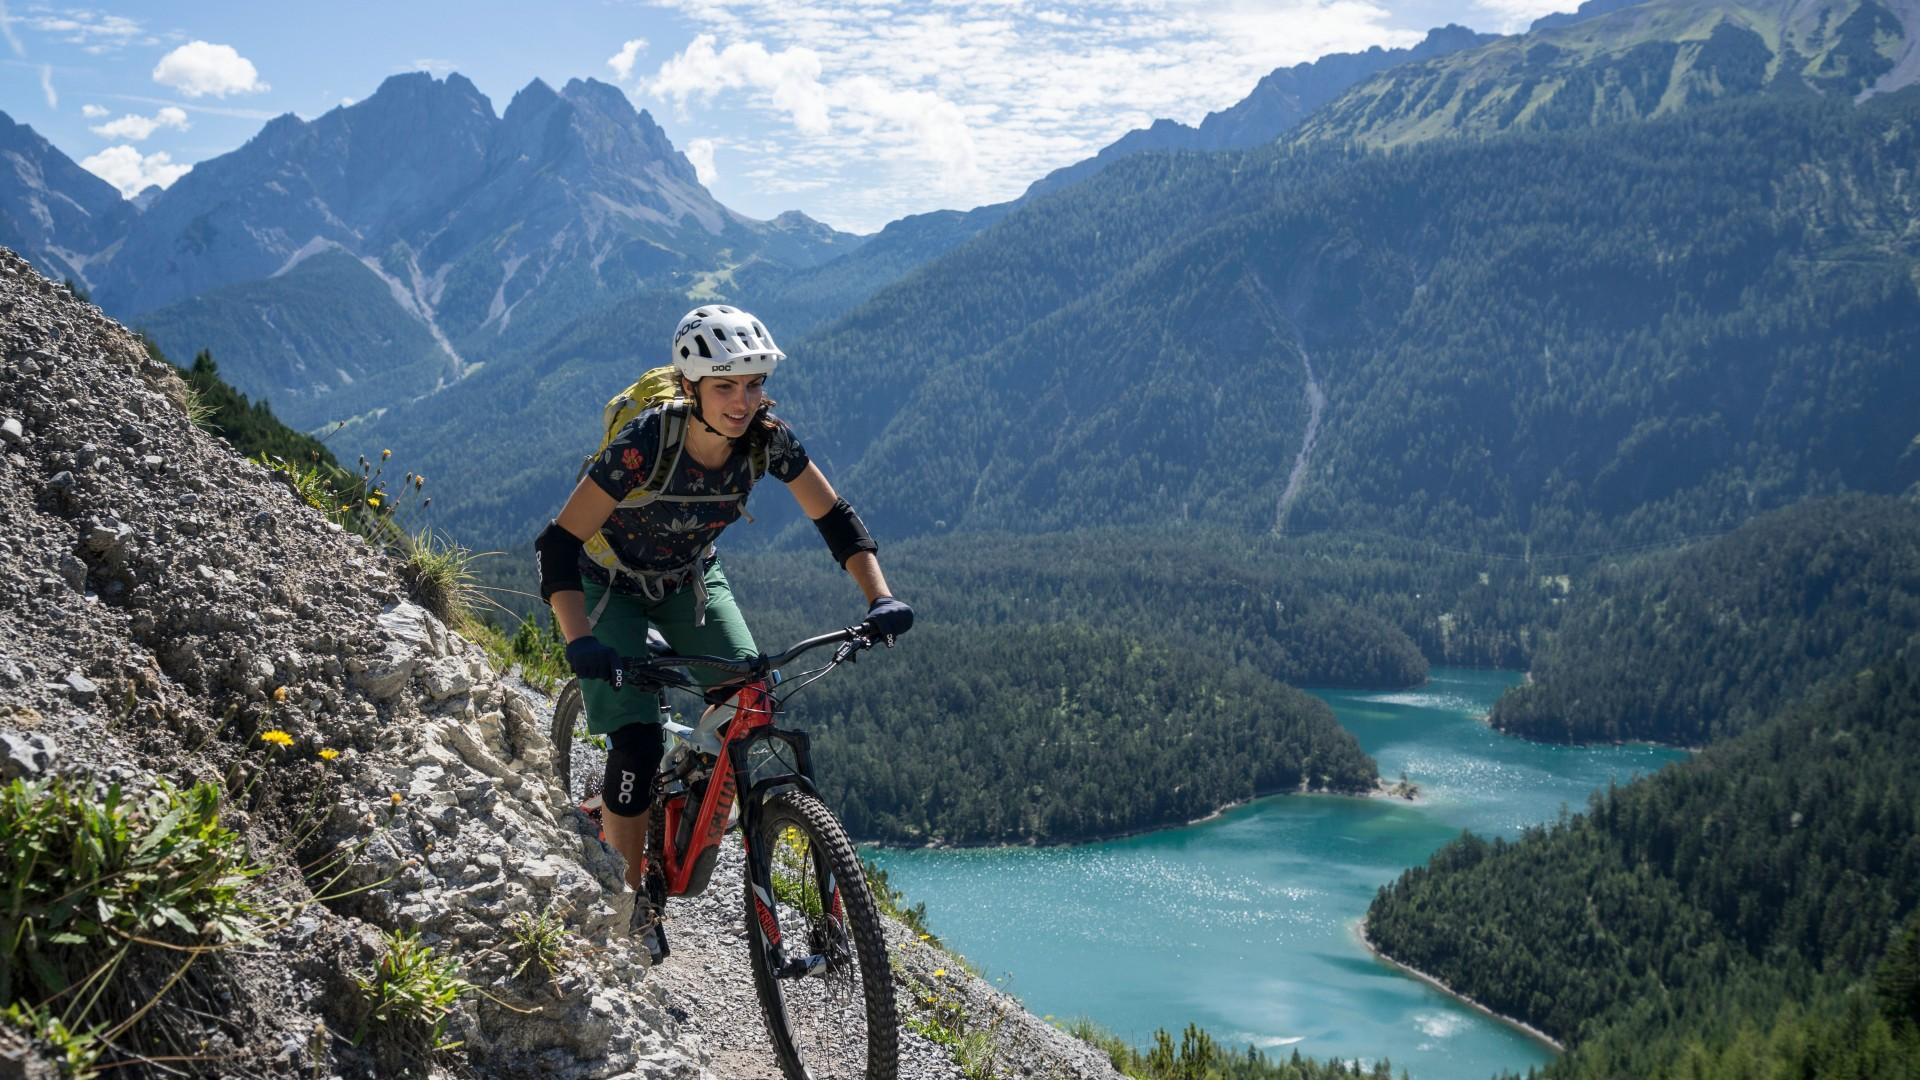 Mountain biking in Tiroler Zugspitz Arena